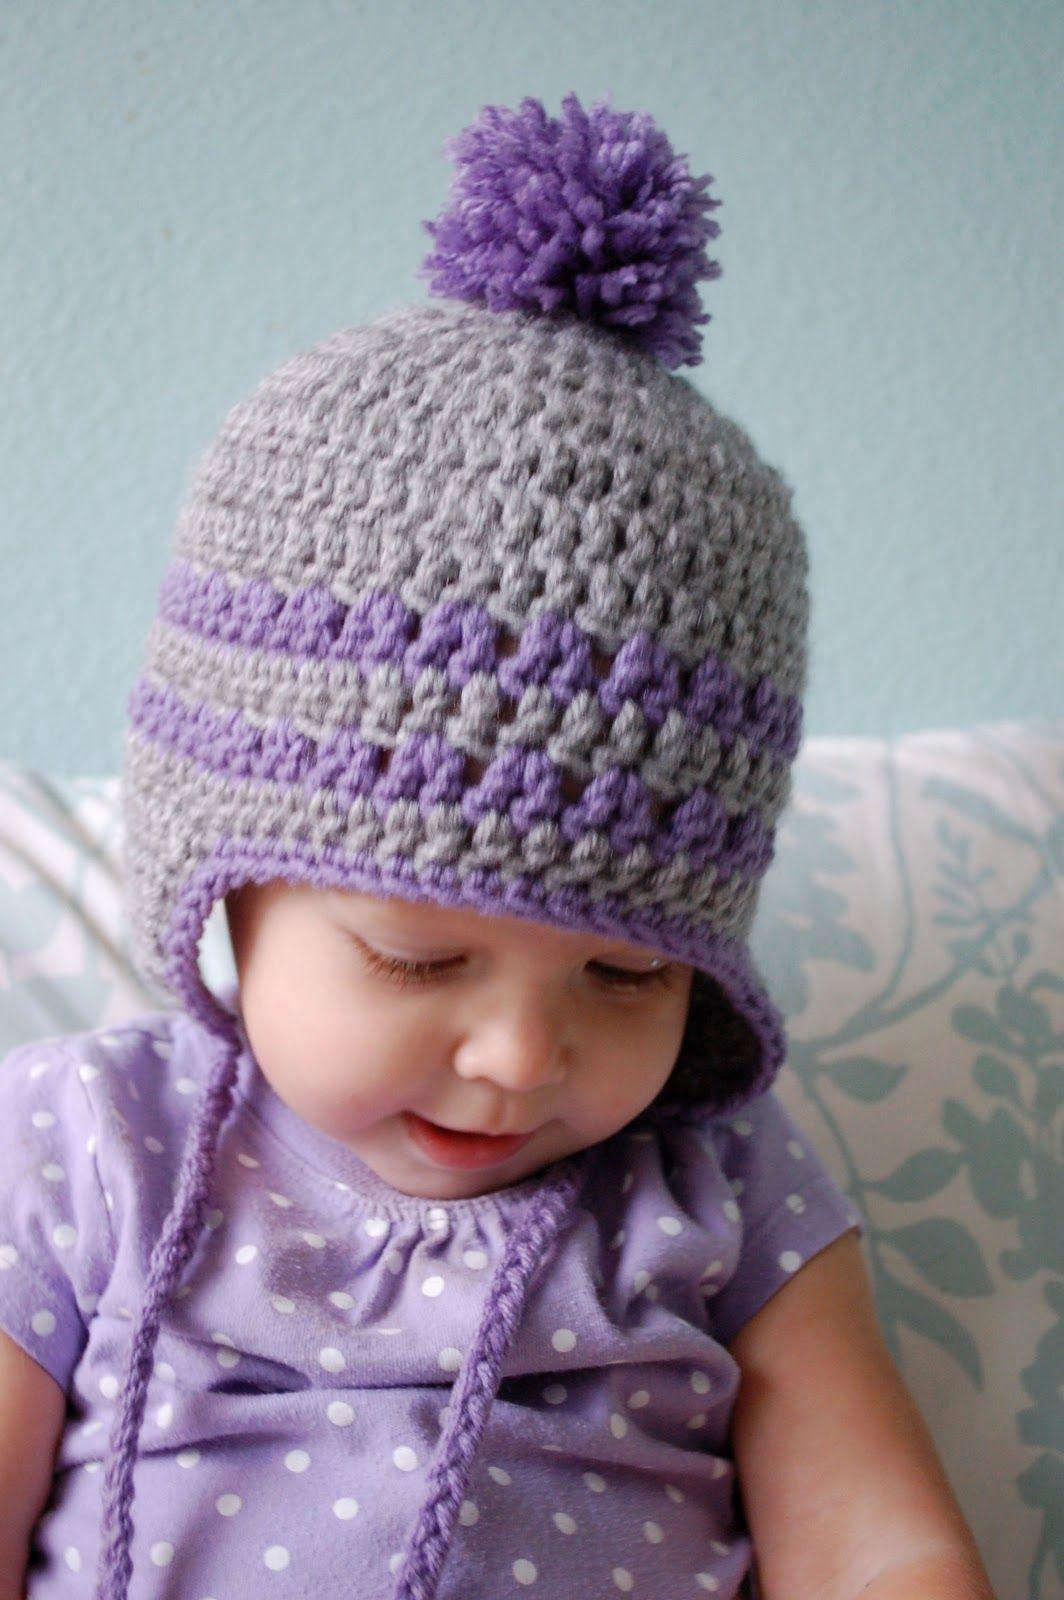 Alli Crafts: Free Pattern: Earflap Hat - 9-12 Months | Crocheting ...